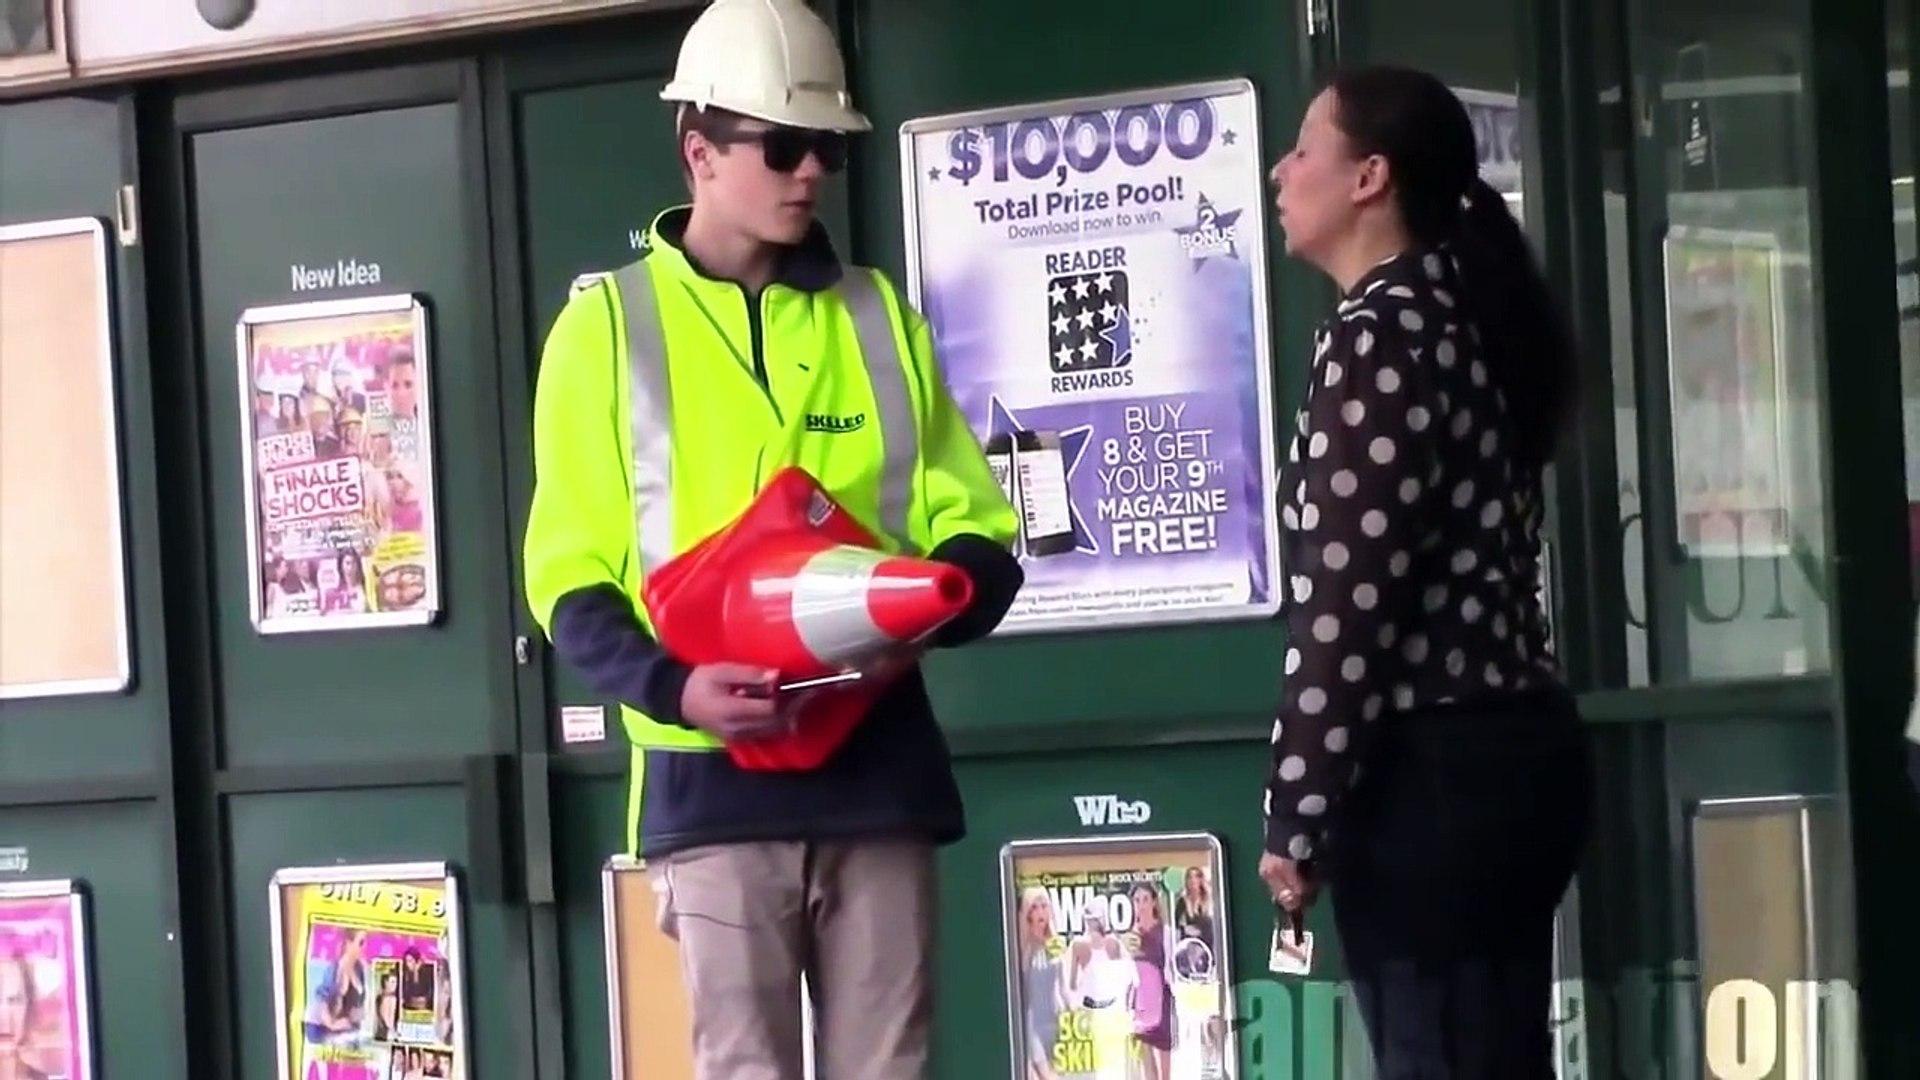 Public Pranks Annoying Construction in Public Pranks on People Funny Pranks Best Pranks 20